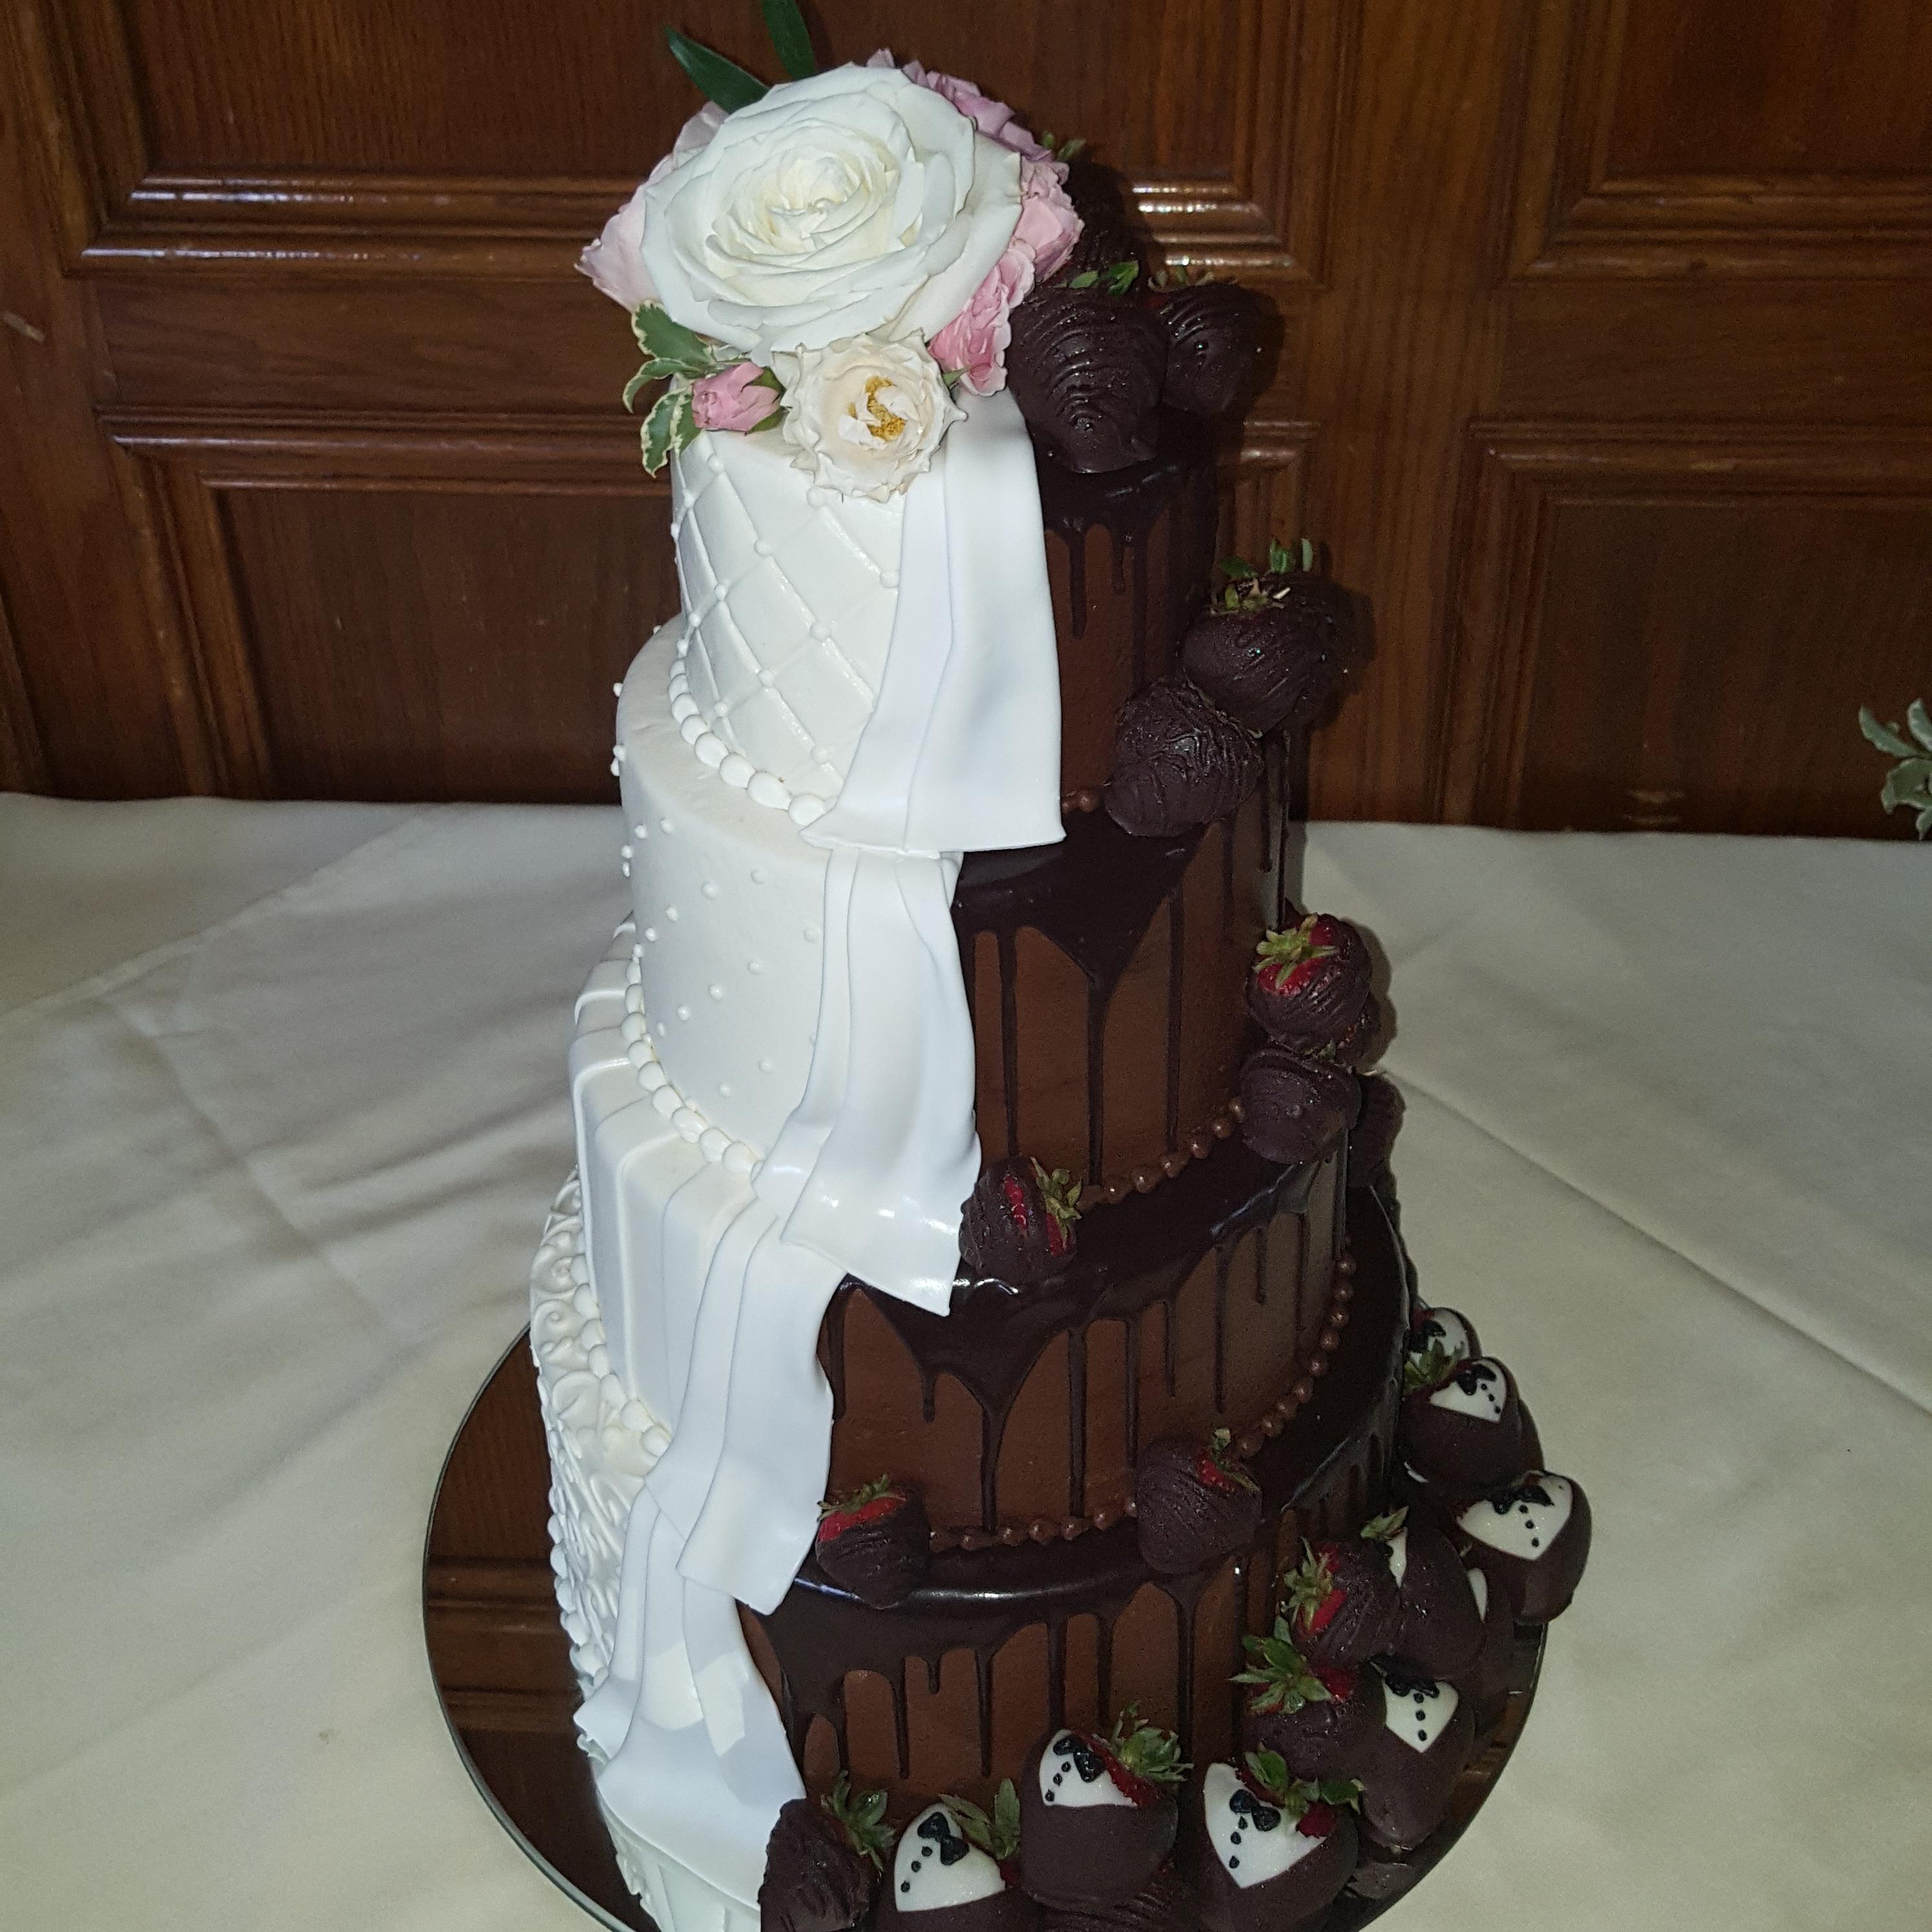 Virginia's Cakes Cafe & Bakery image 1